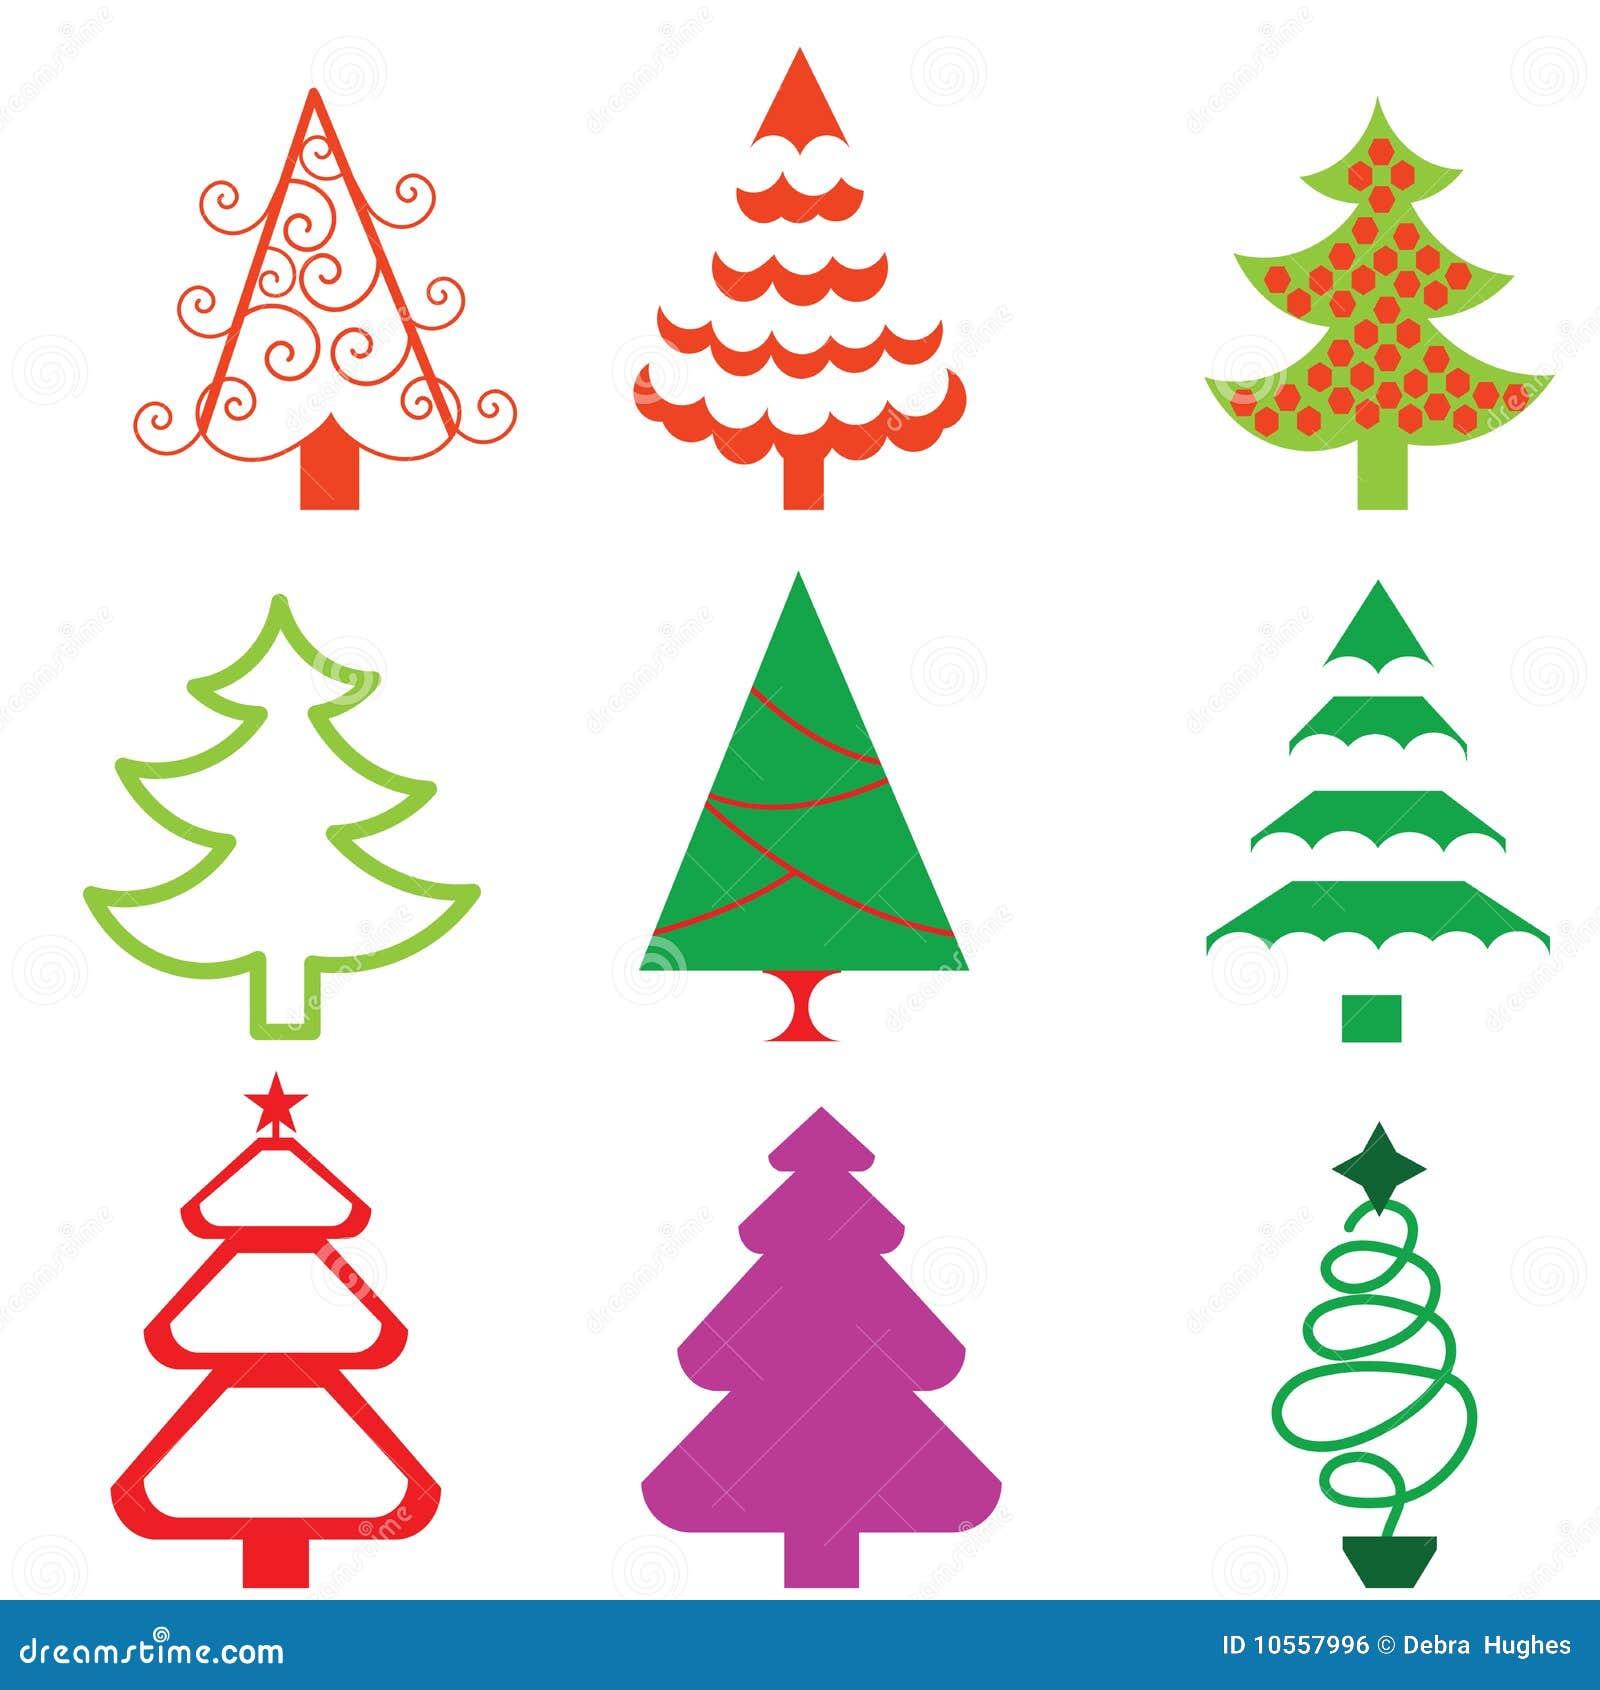 whimsical christmas tree clip art free - photo #11